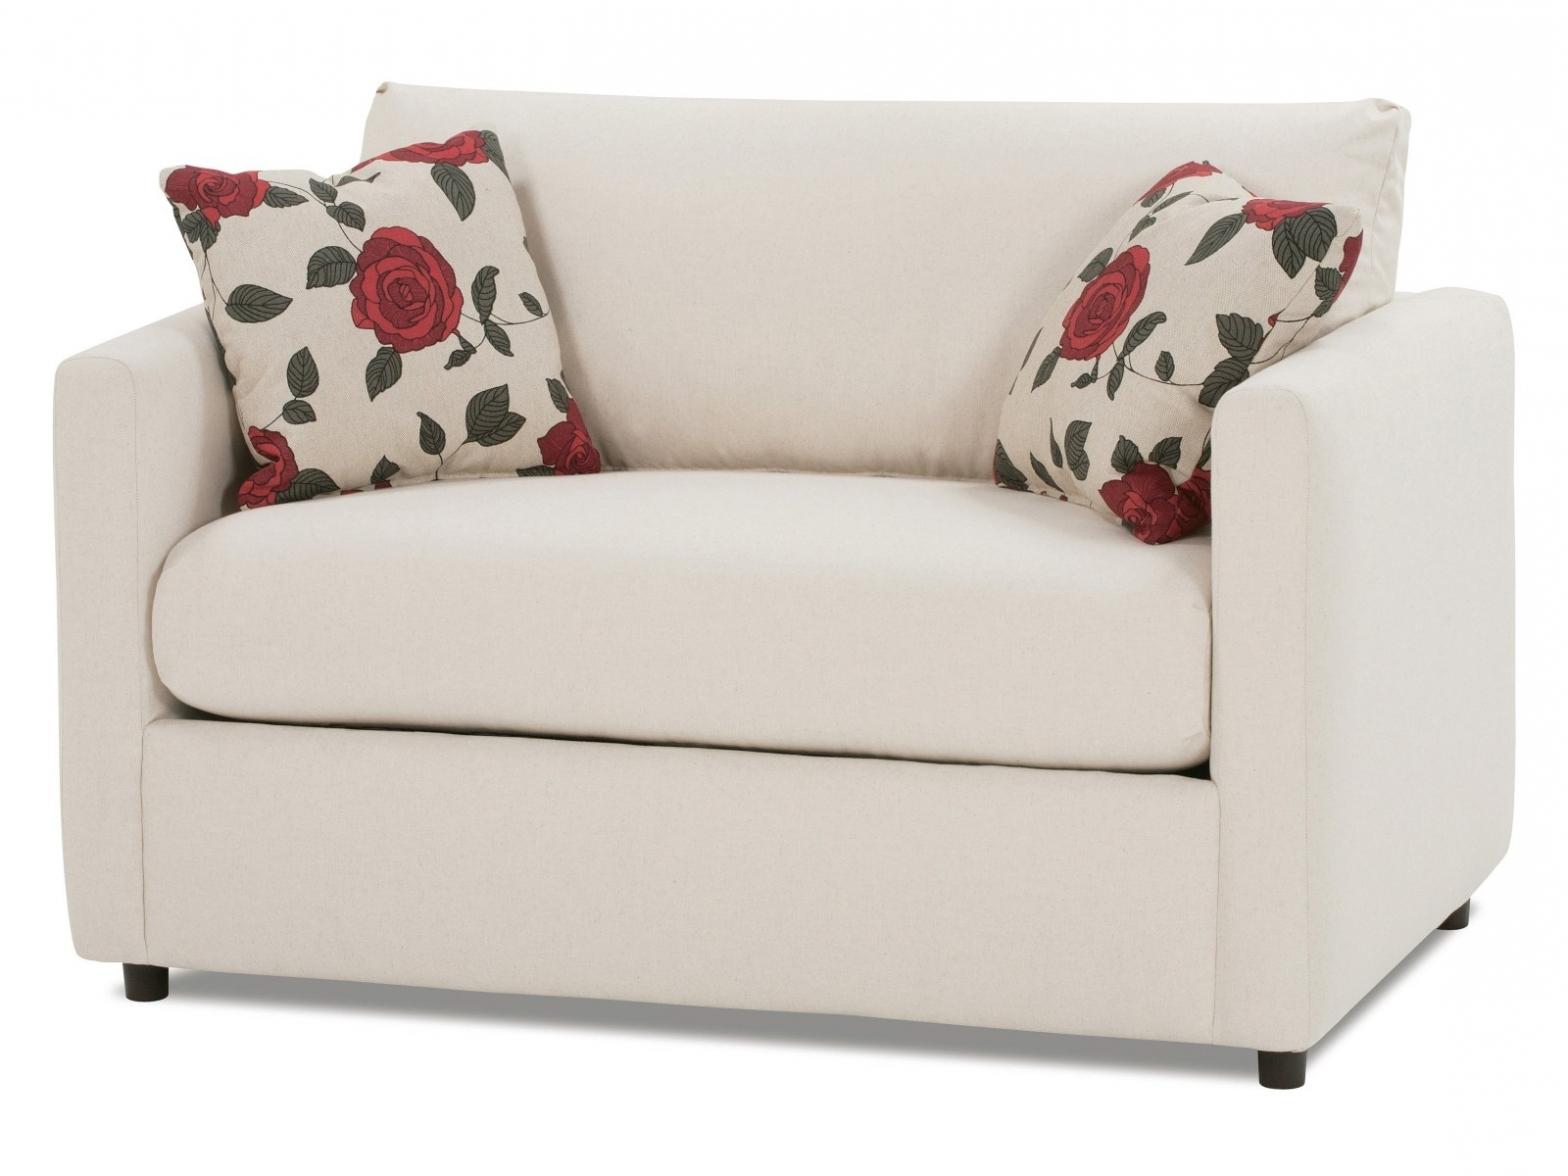 Furniture: ▻ Sofa : 11 Nice Twin Sleeper Sofa Ikea Cool Small In Most Up To Date Twin Sleeper Sofa Chairs (View 13 of 15)